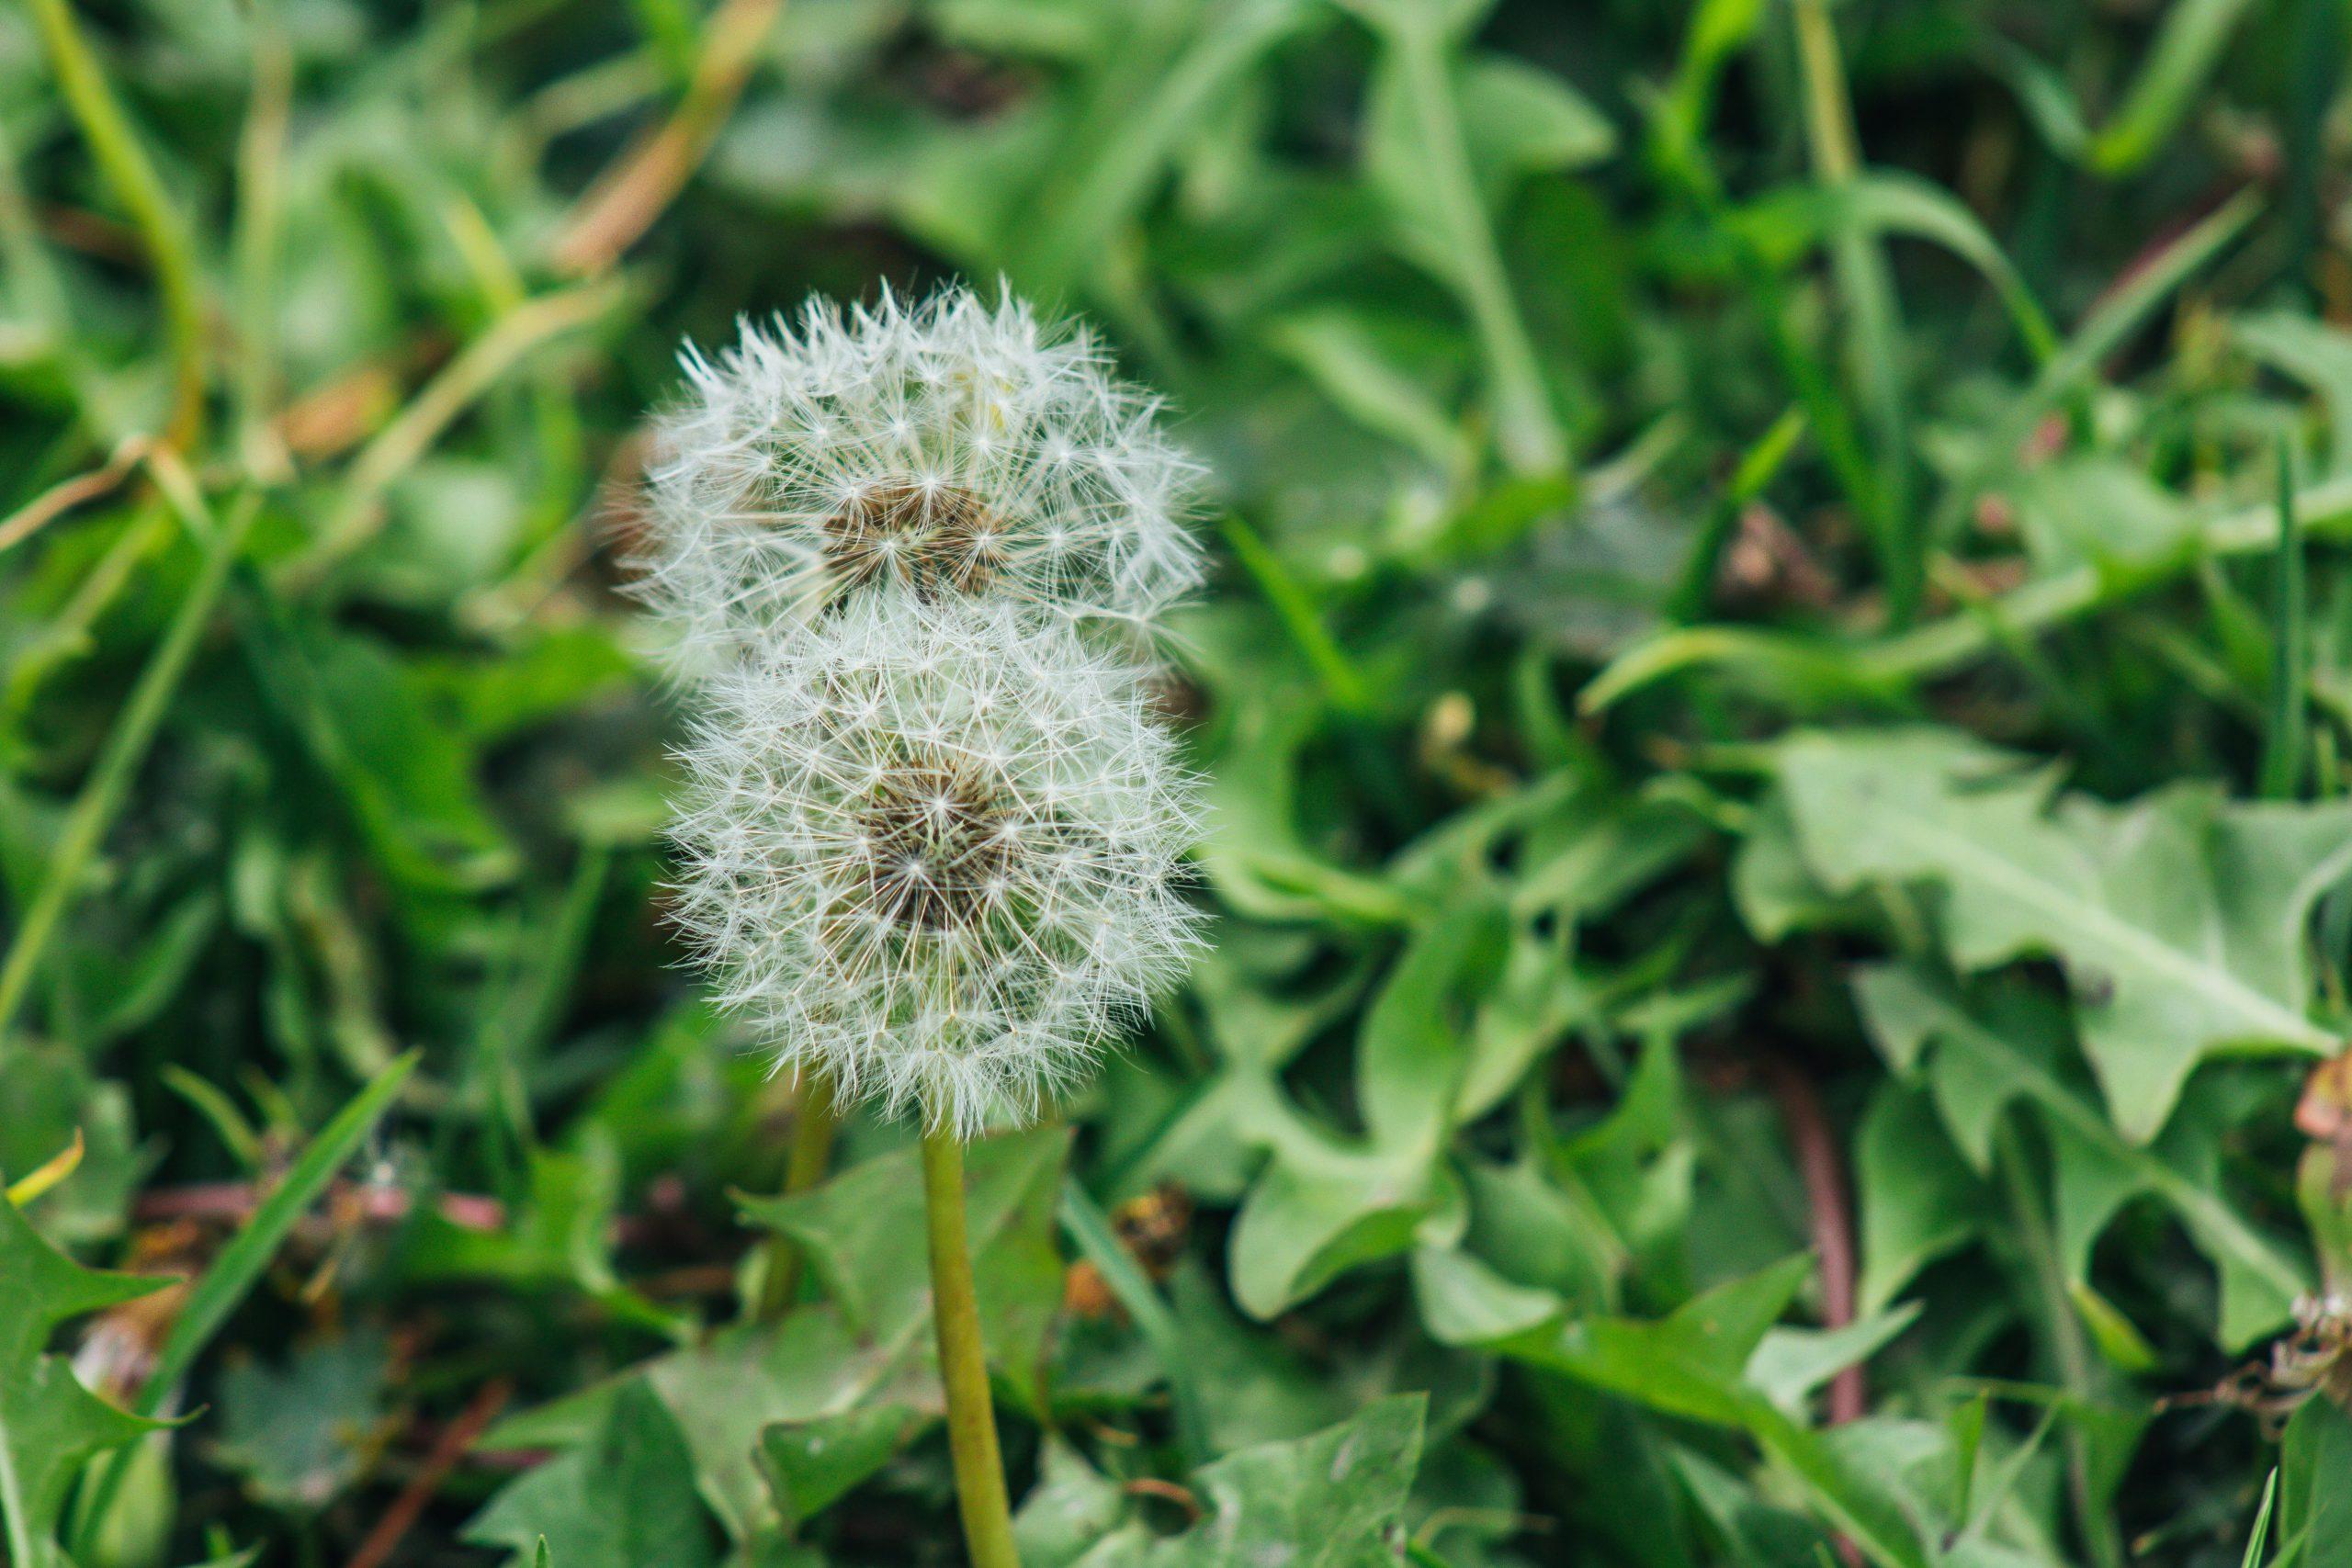 Iron source: Dandelion Seeds with Dandelion greens